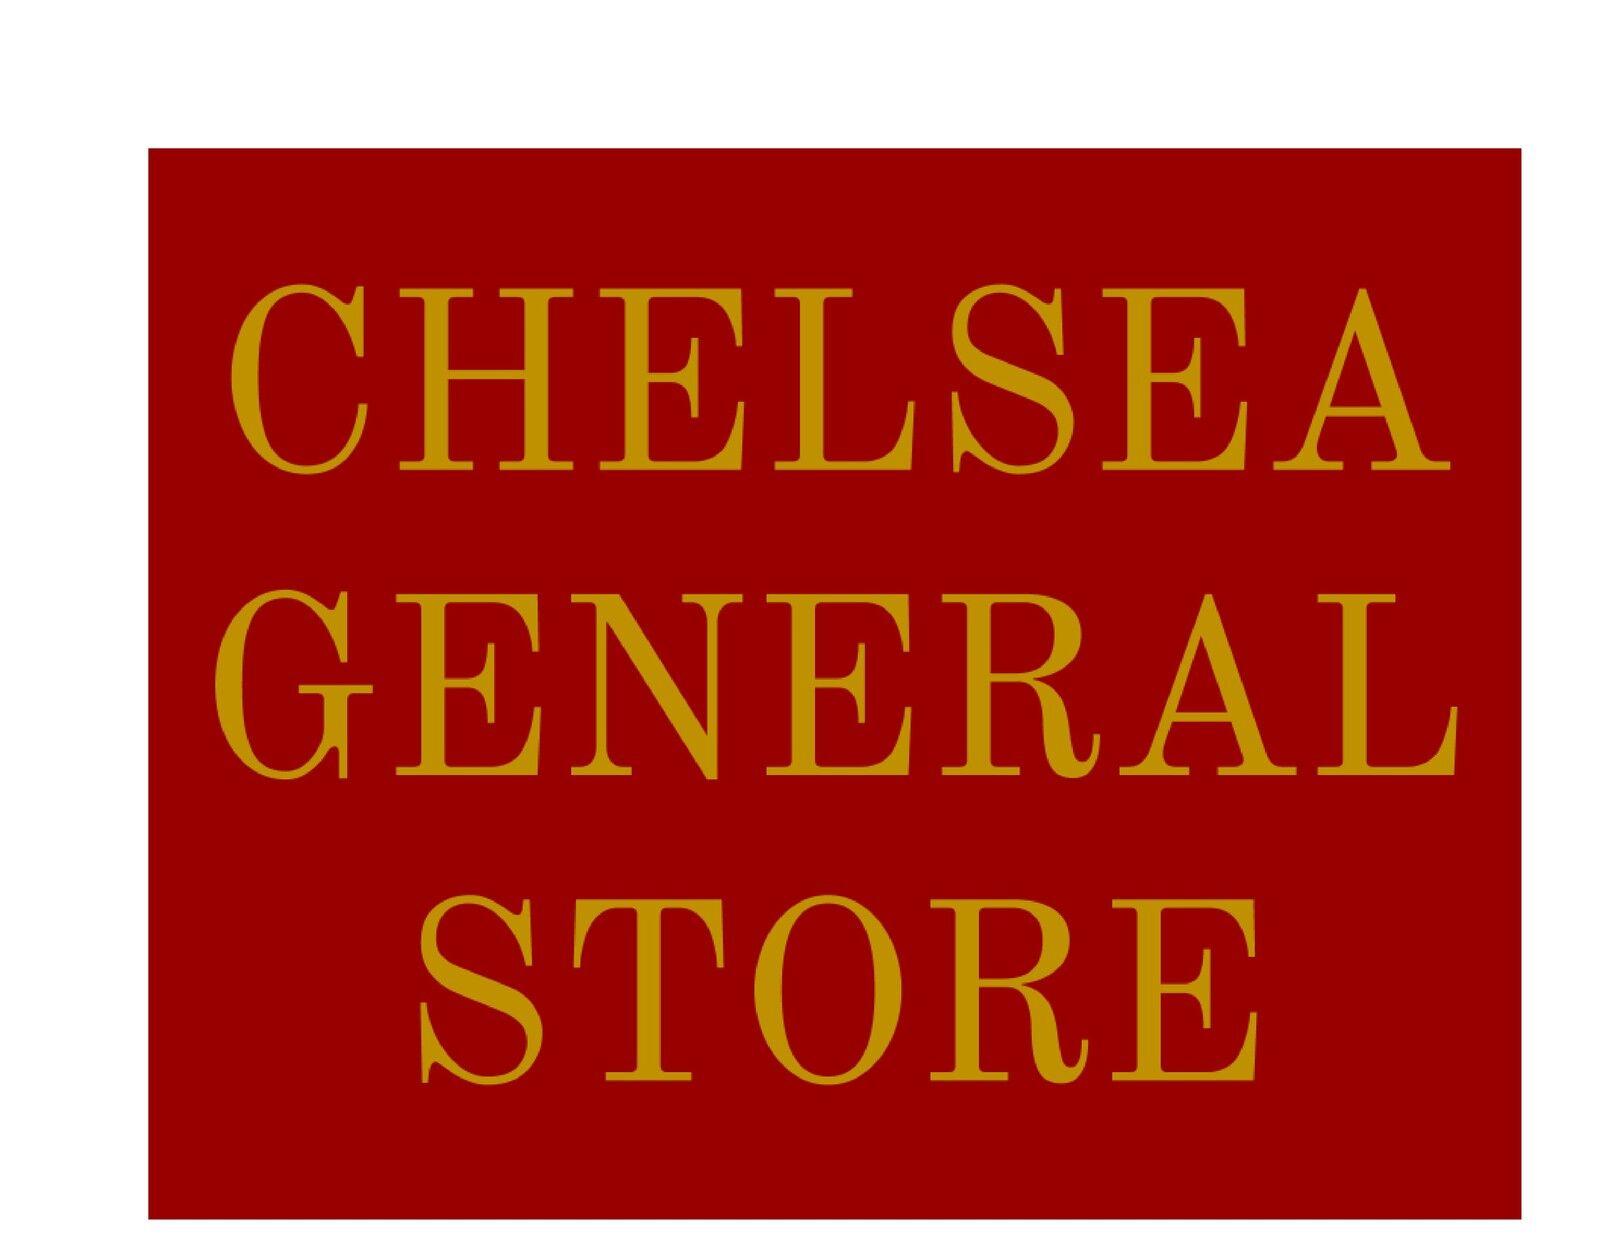 Chelsea General Store